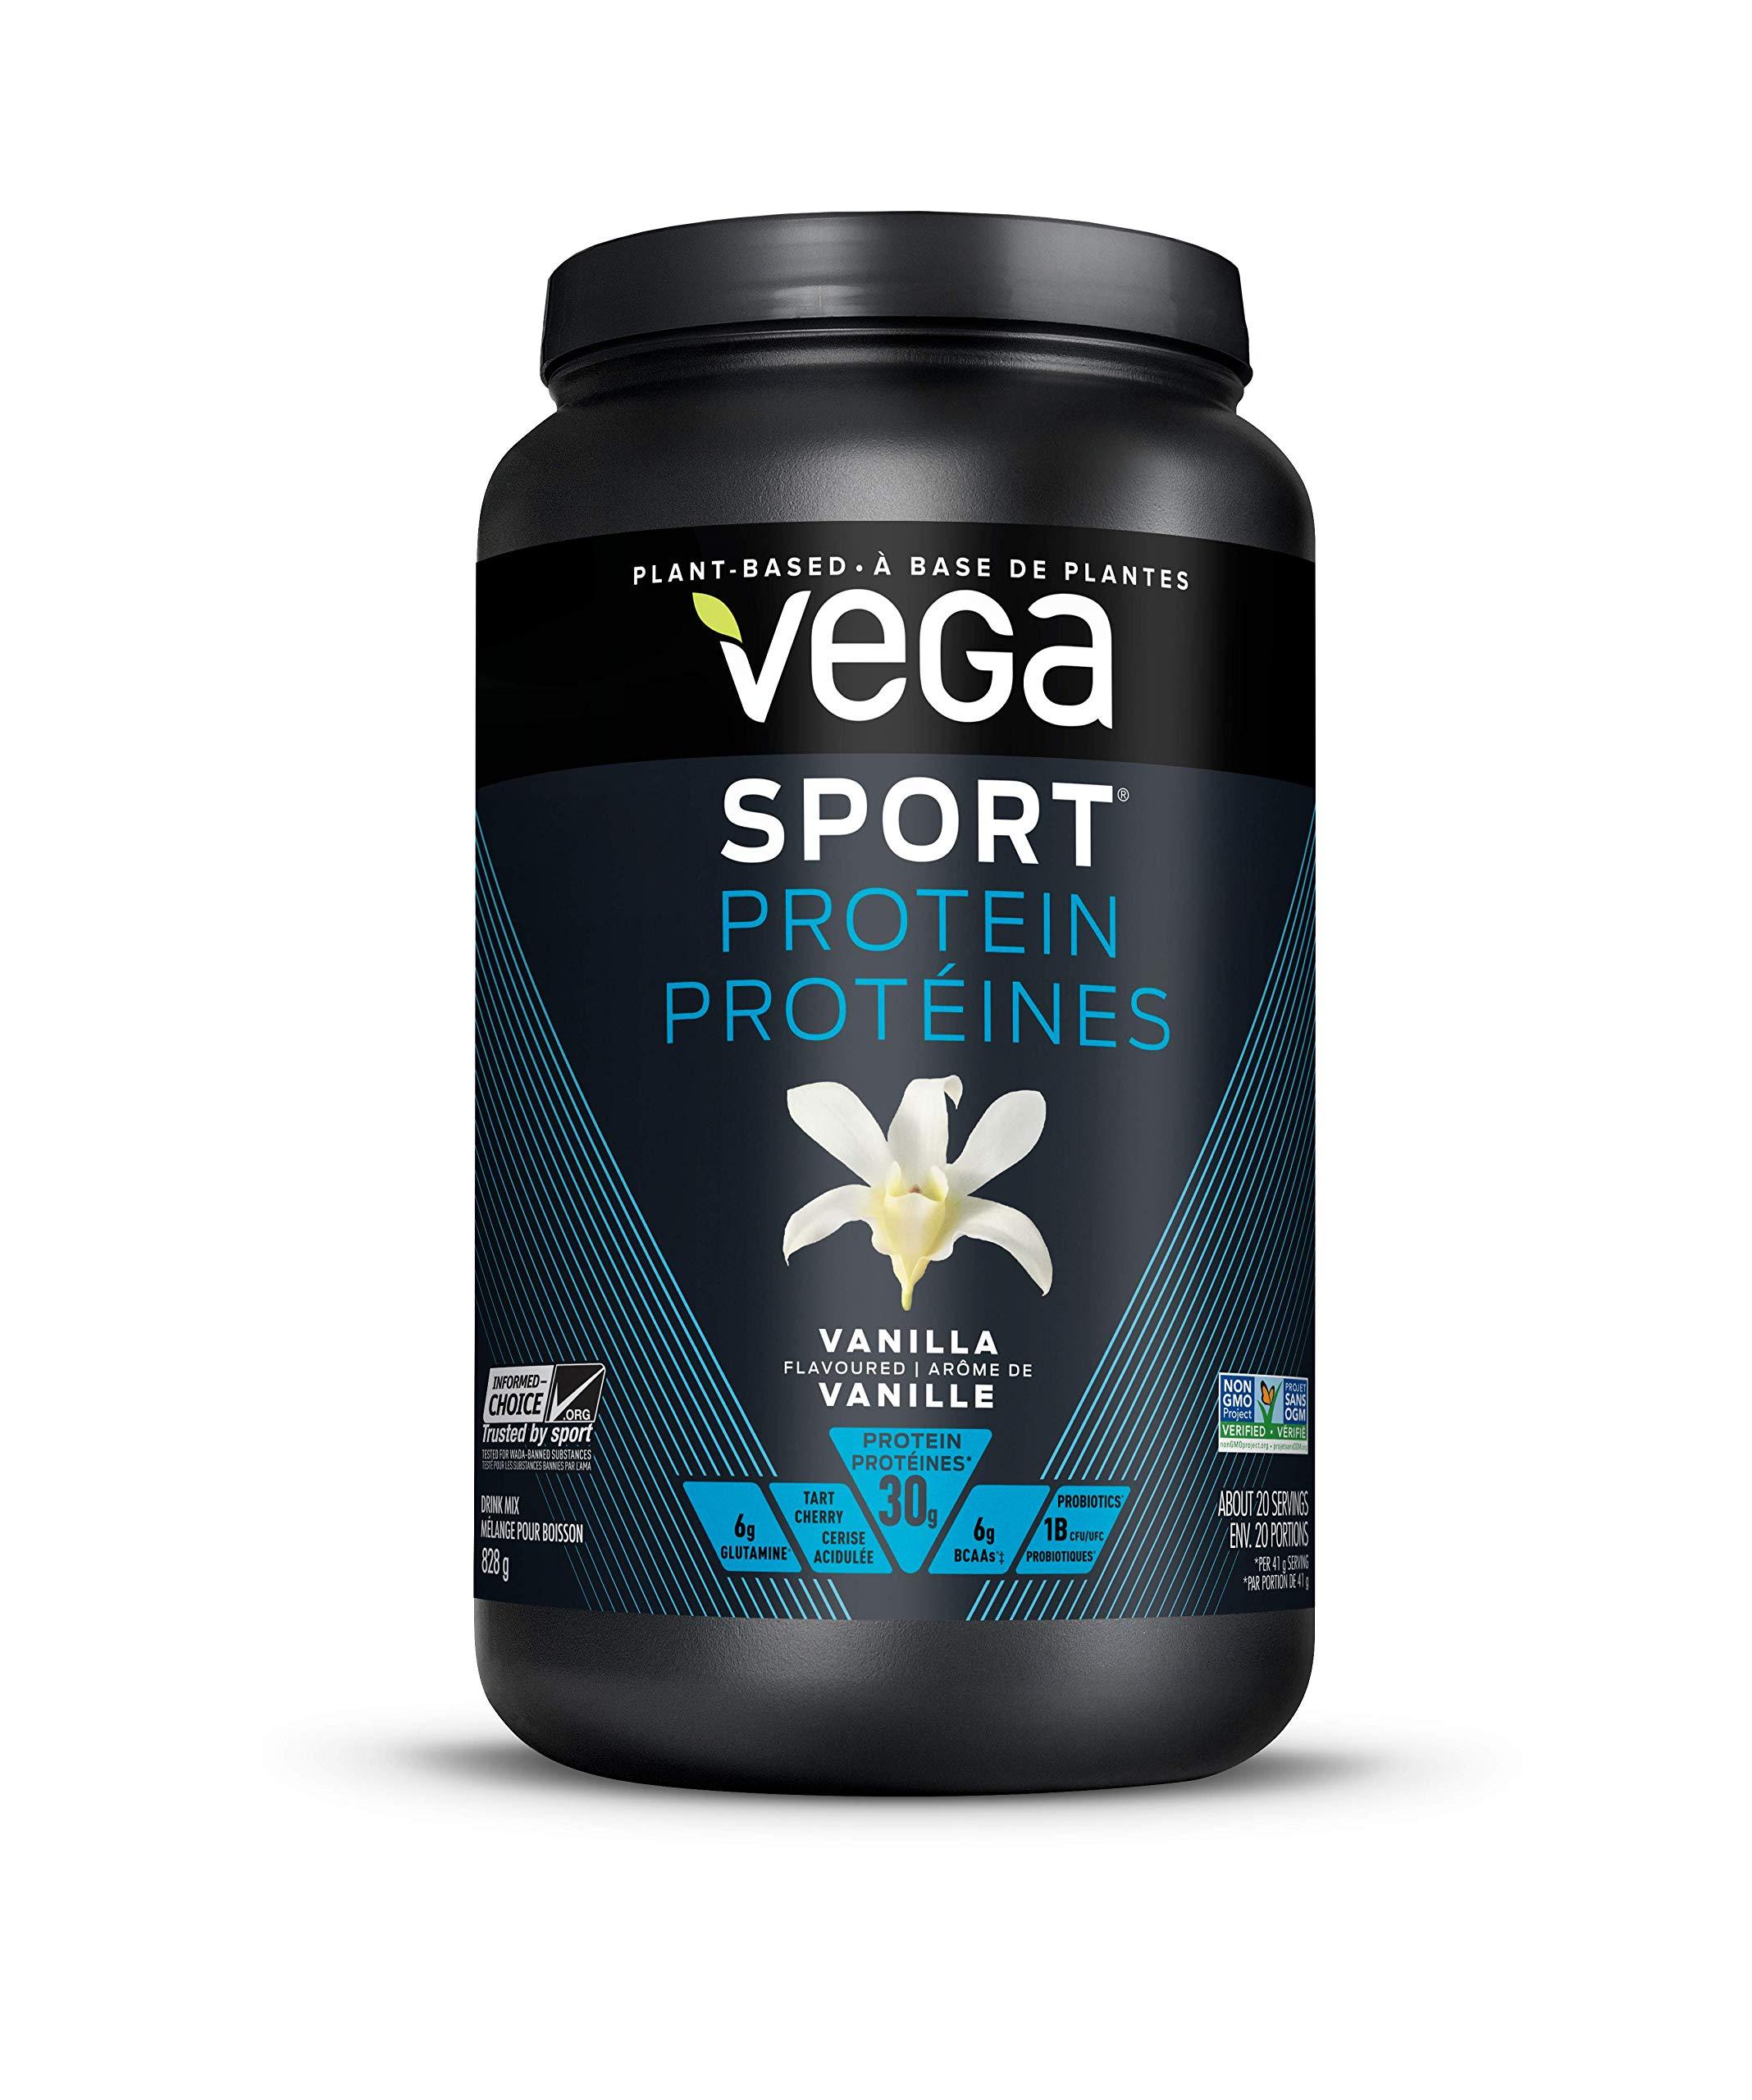 VEGA Sport Protein Vanilla Tub, 828 GR by VEGA